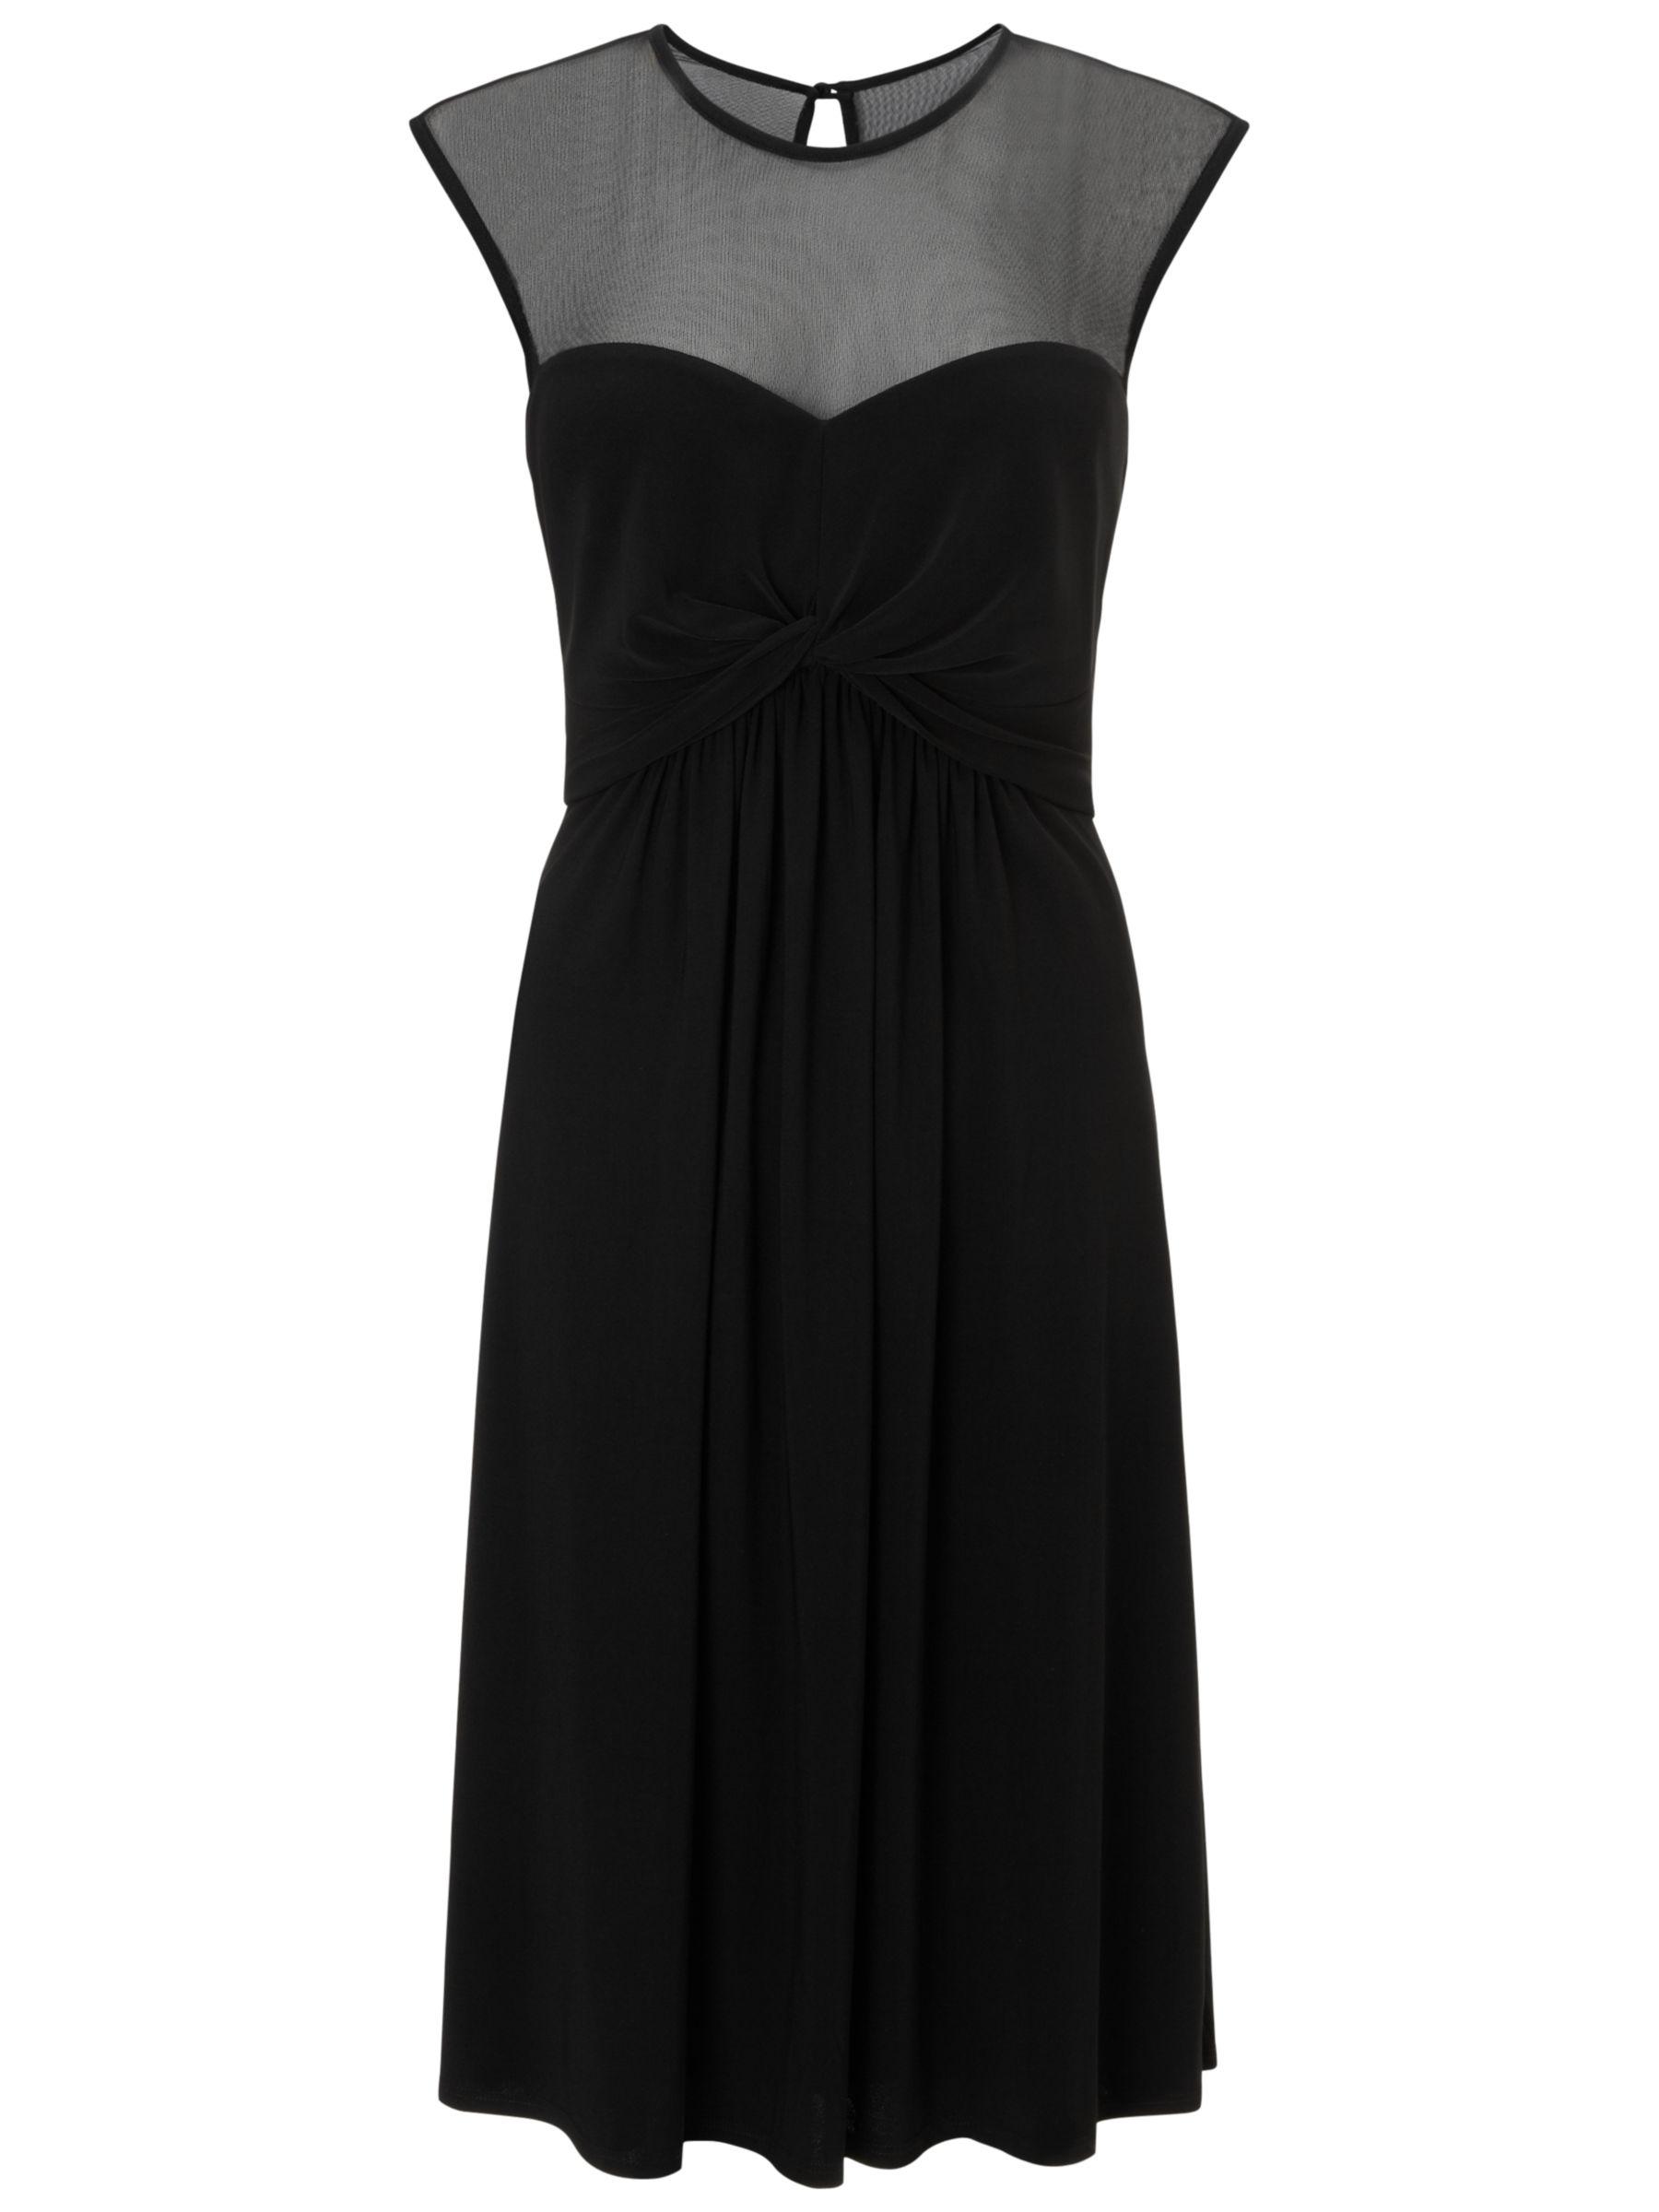 ariella charlie mesh yoke dress black, ariella, charlie, mesh, yoke, dress, black, 14|18|16|12|10|8, women, plus size, womens dresses, edition magazine, little black dress, 1621449